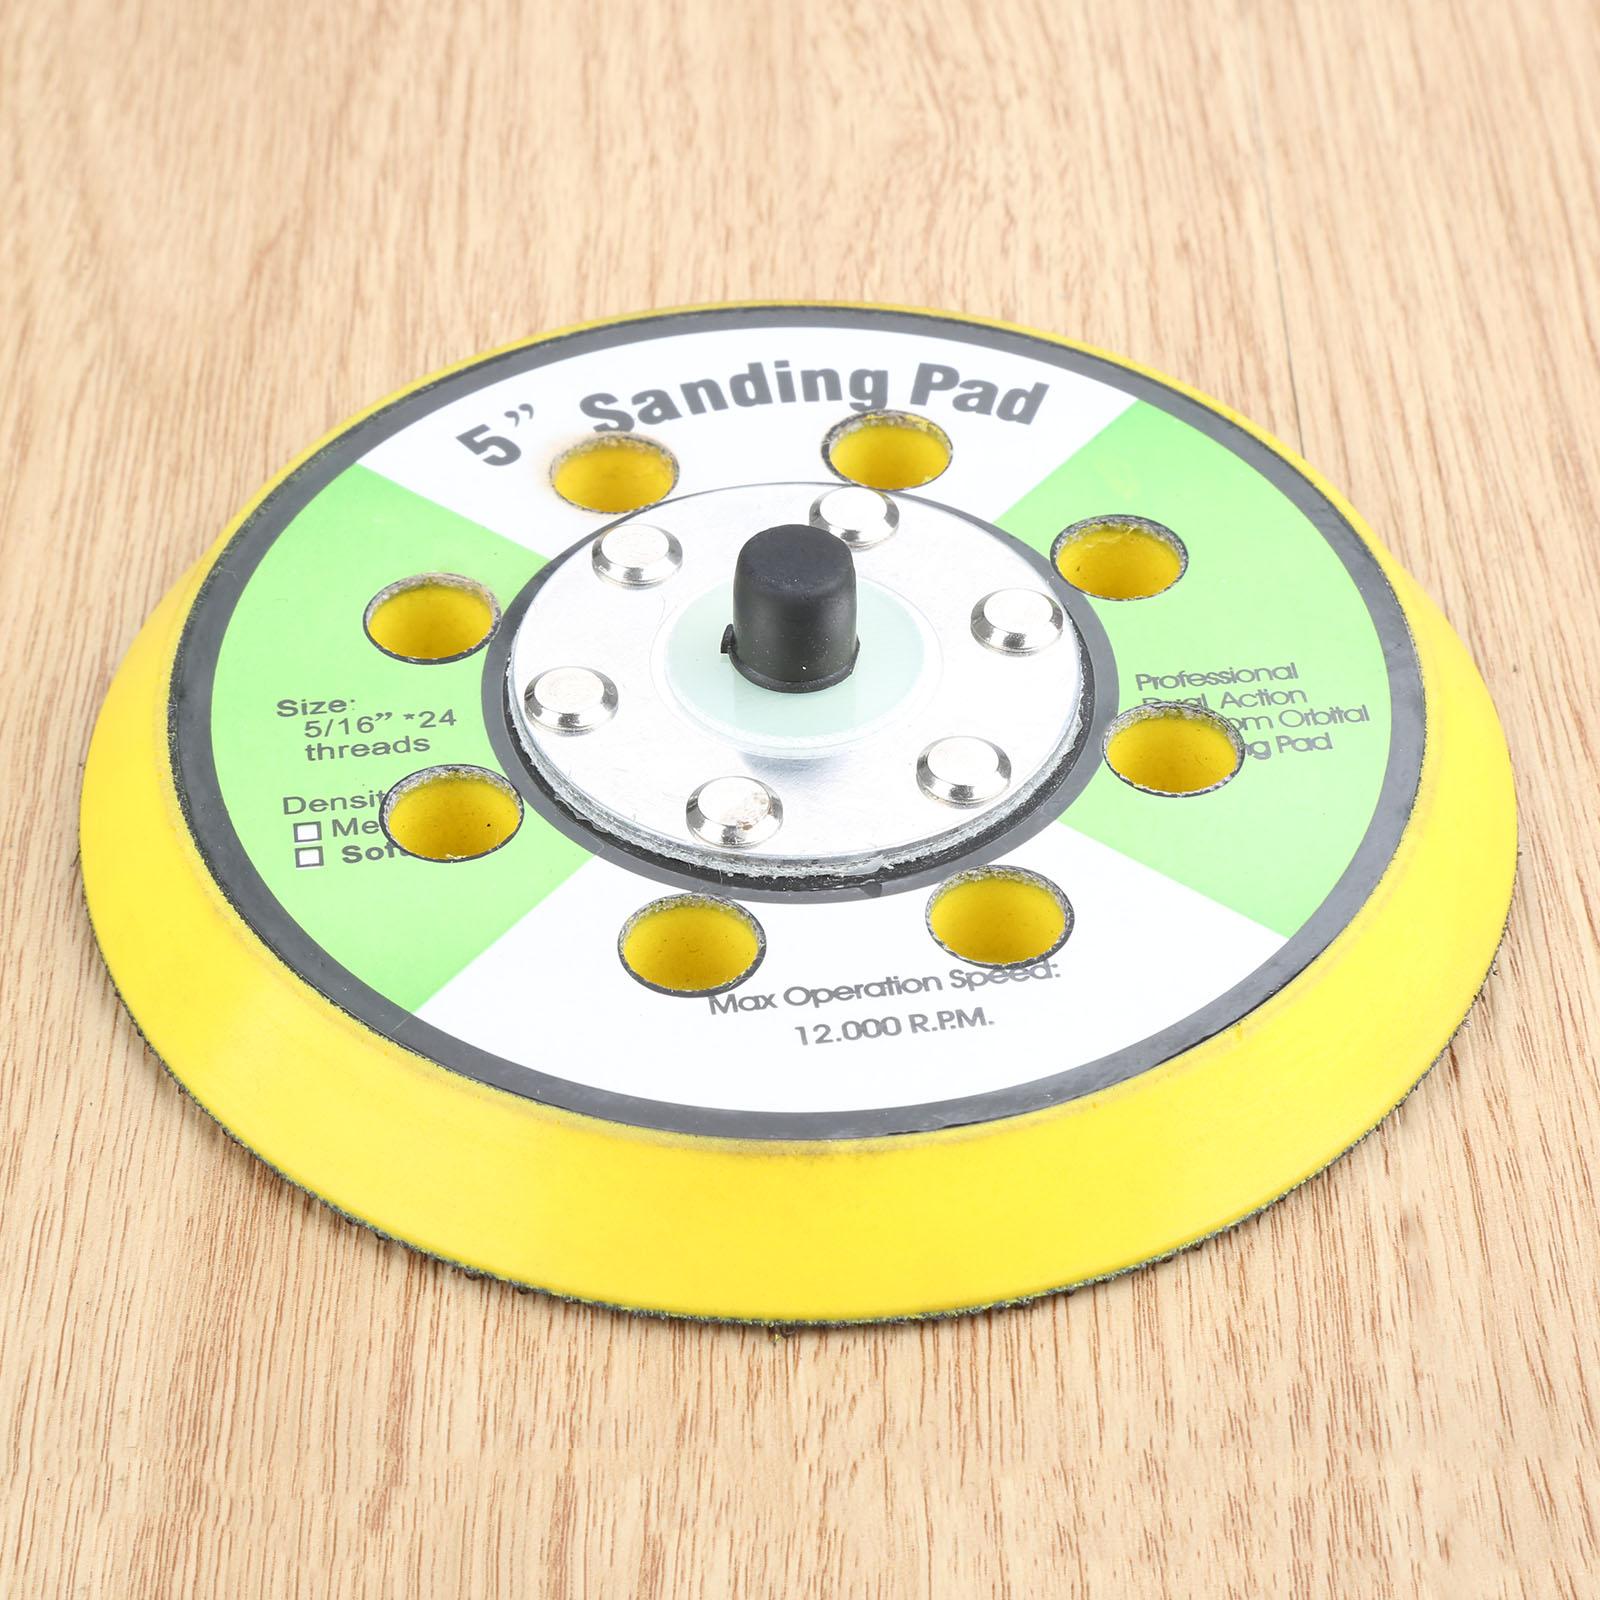 DRELD 125mm 8 Hole Sanding Pad 5